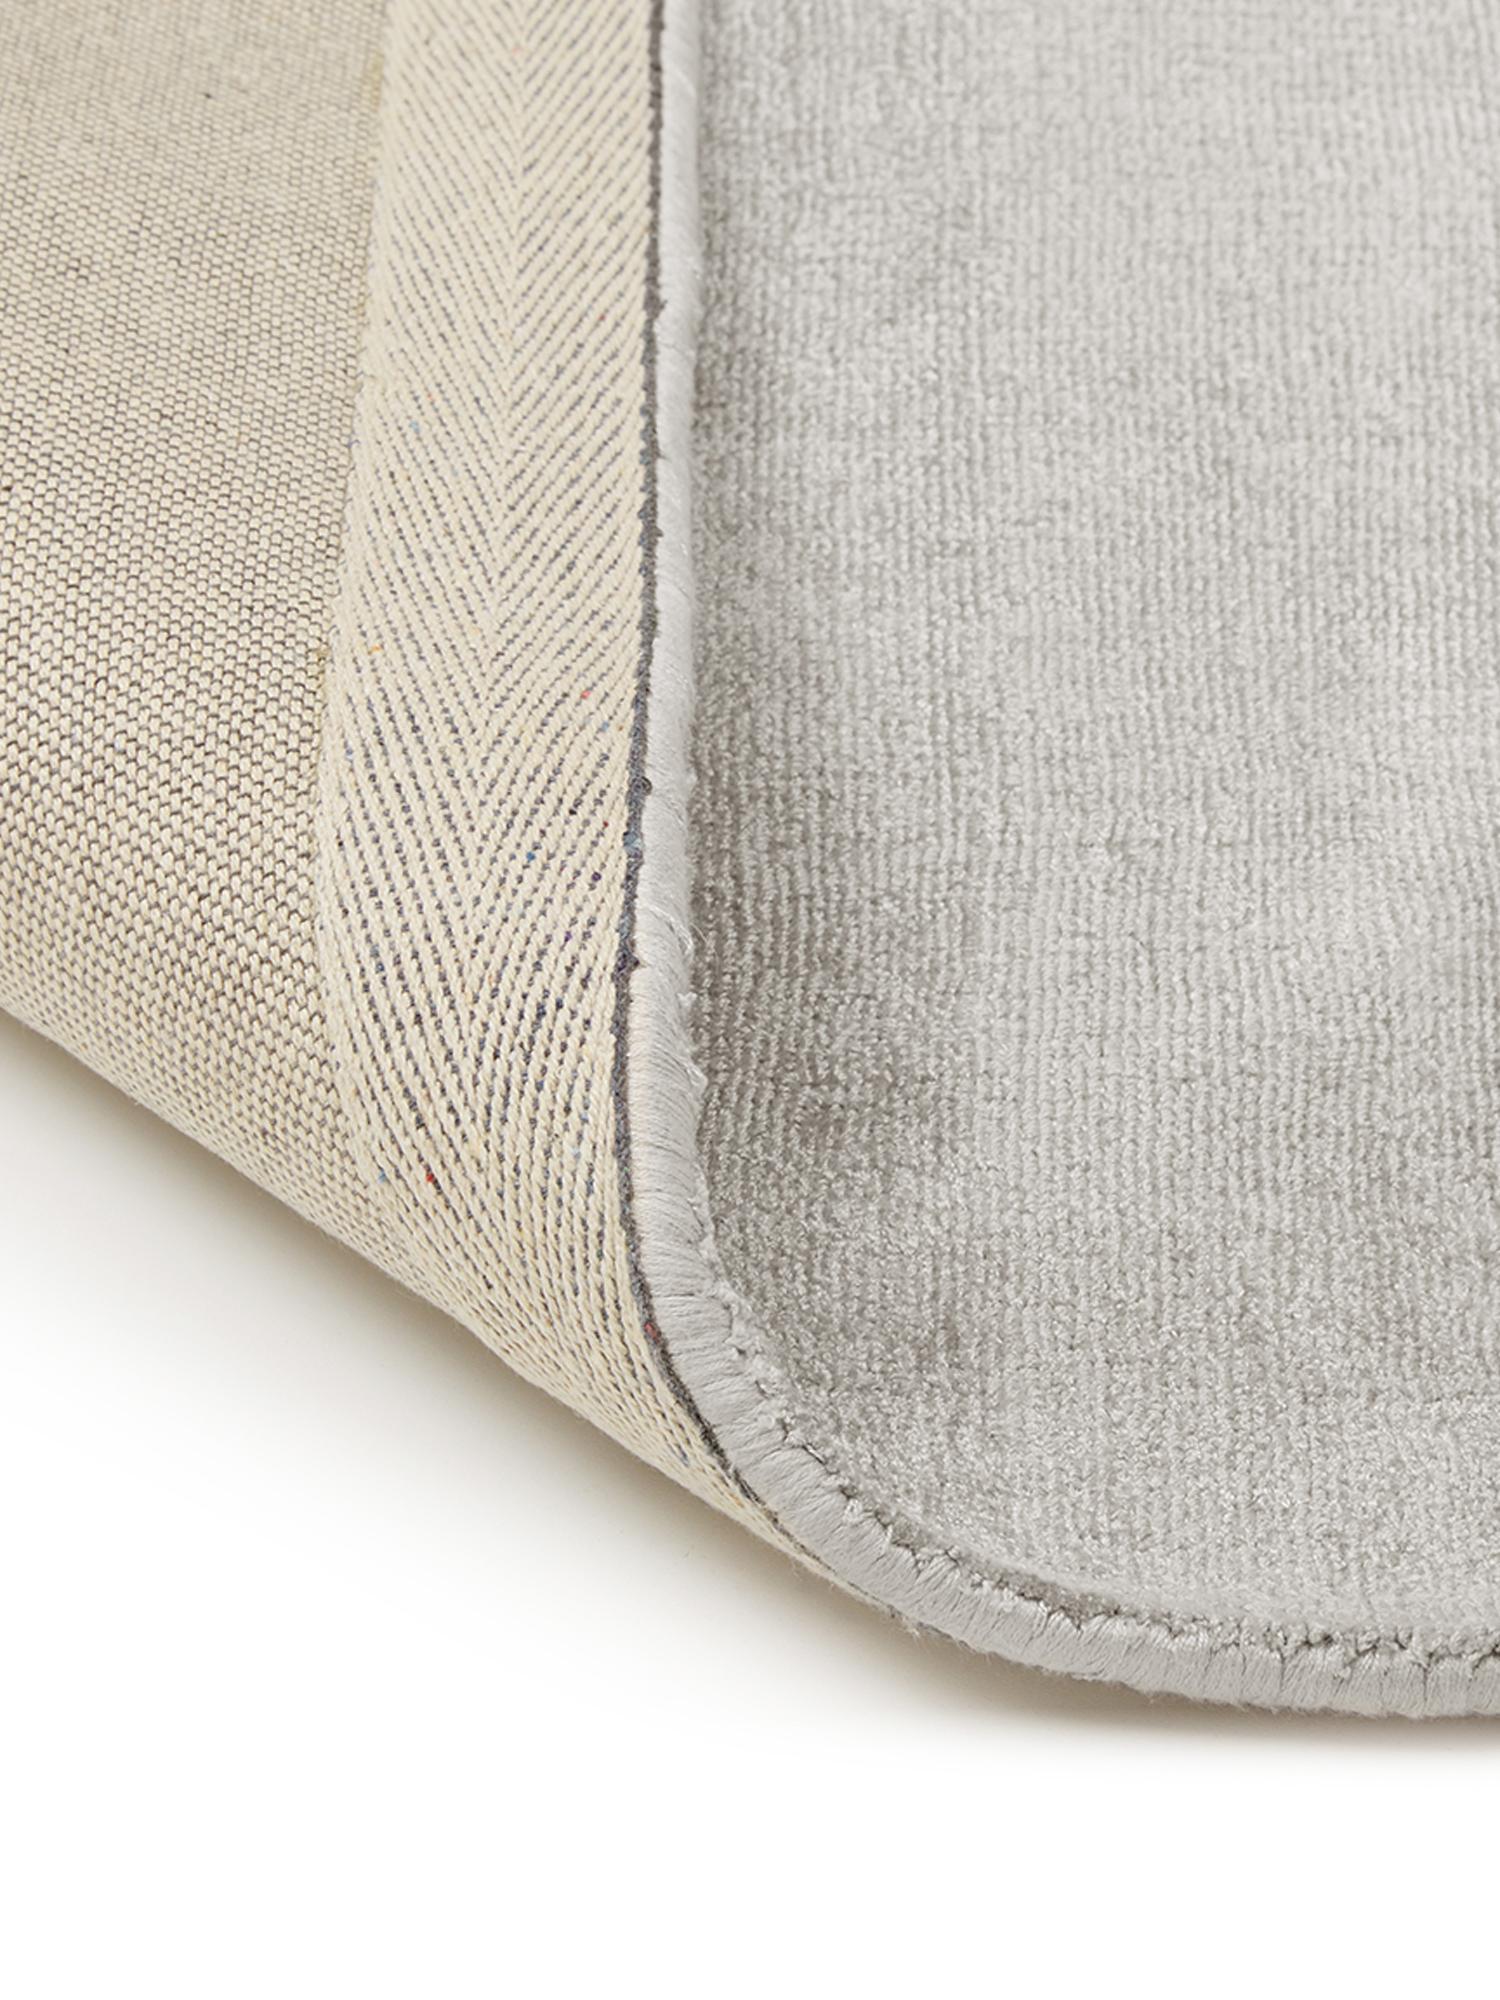 Alfombra artesanal de viscosa Jane, Parte superior: 100%viscosa, Reverso: 100%algodón, Gris claro, beige, An 400 x L 500 cm (Tamaño XXL)